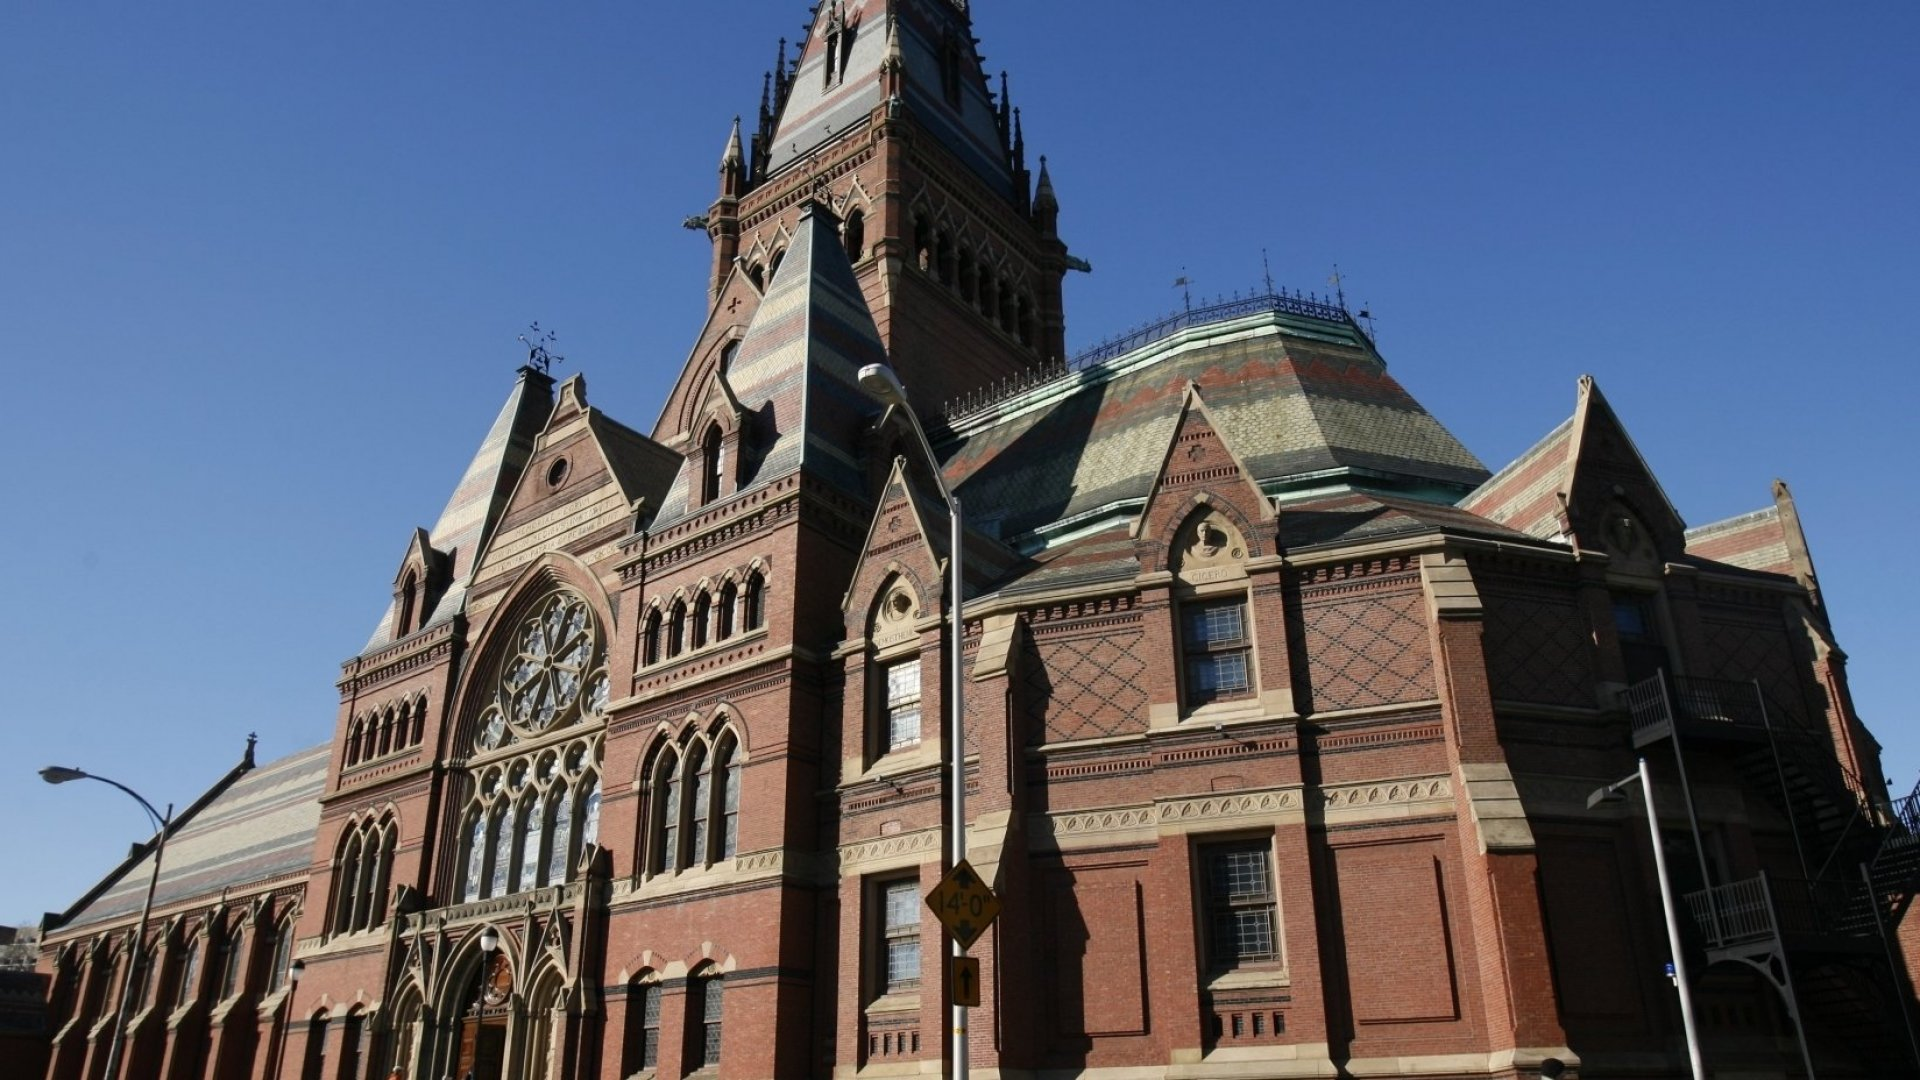 Harvard University campus, the exterior view of Memorial Hall.